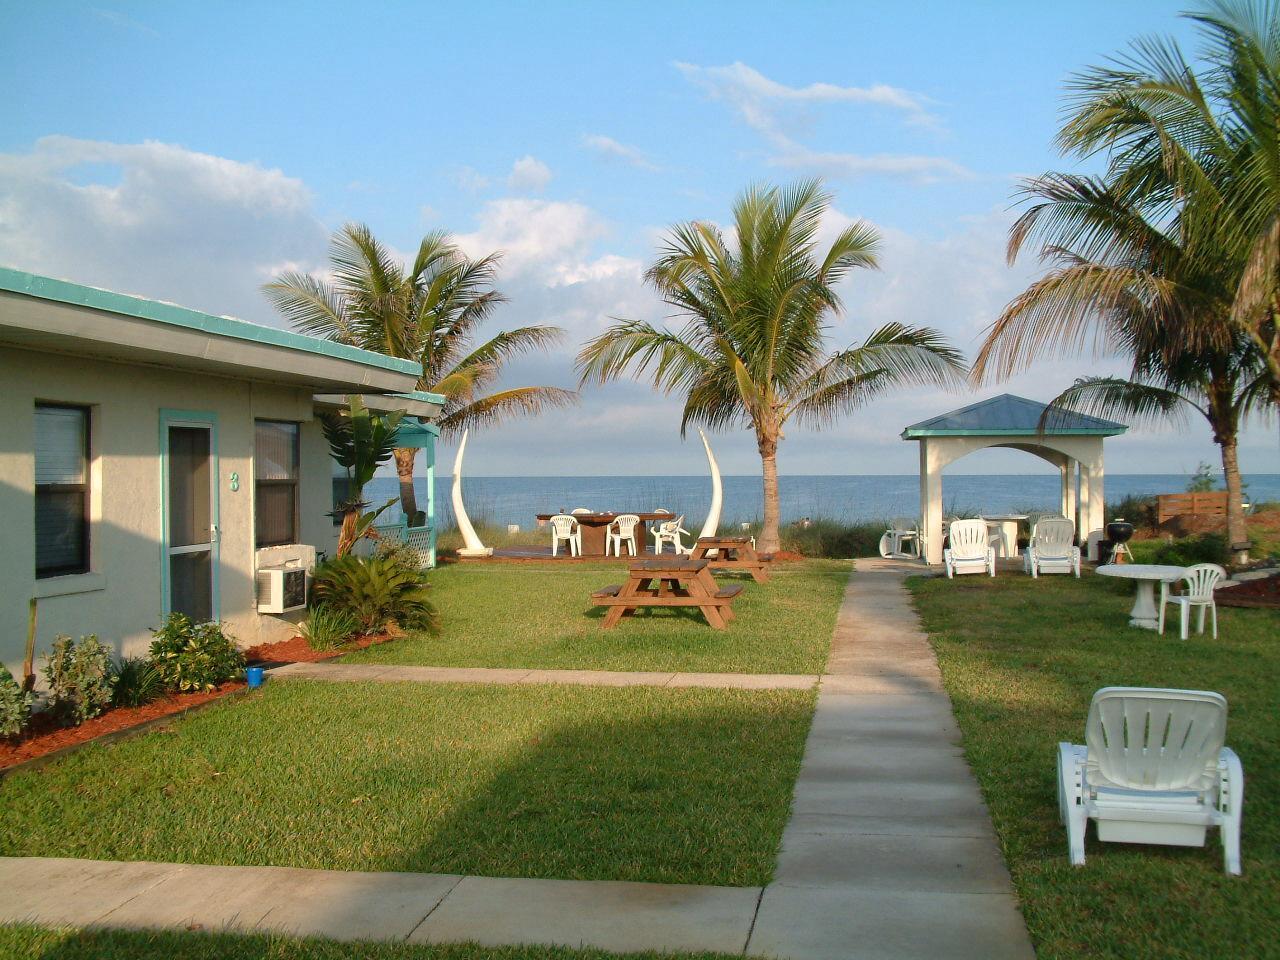 Gulf Sands Beach Motel On The Beach Beach Front Florida Vacation On Casey Key In Nokomis